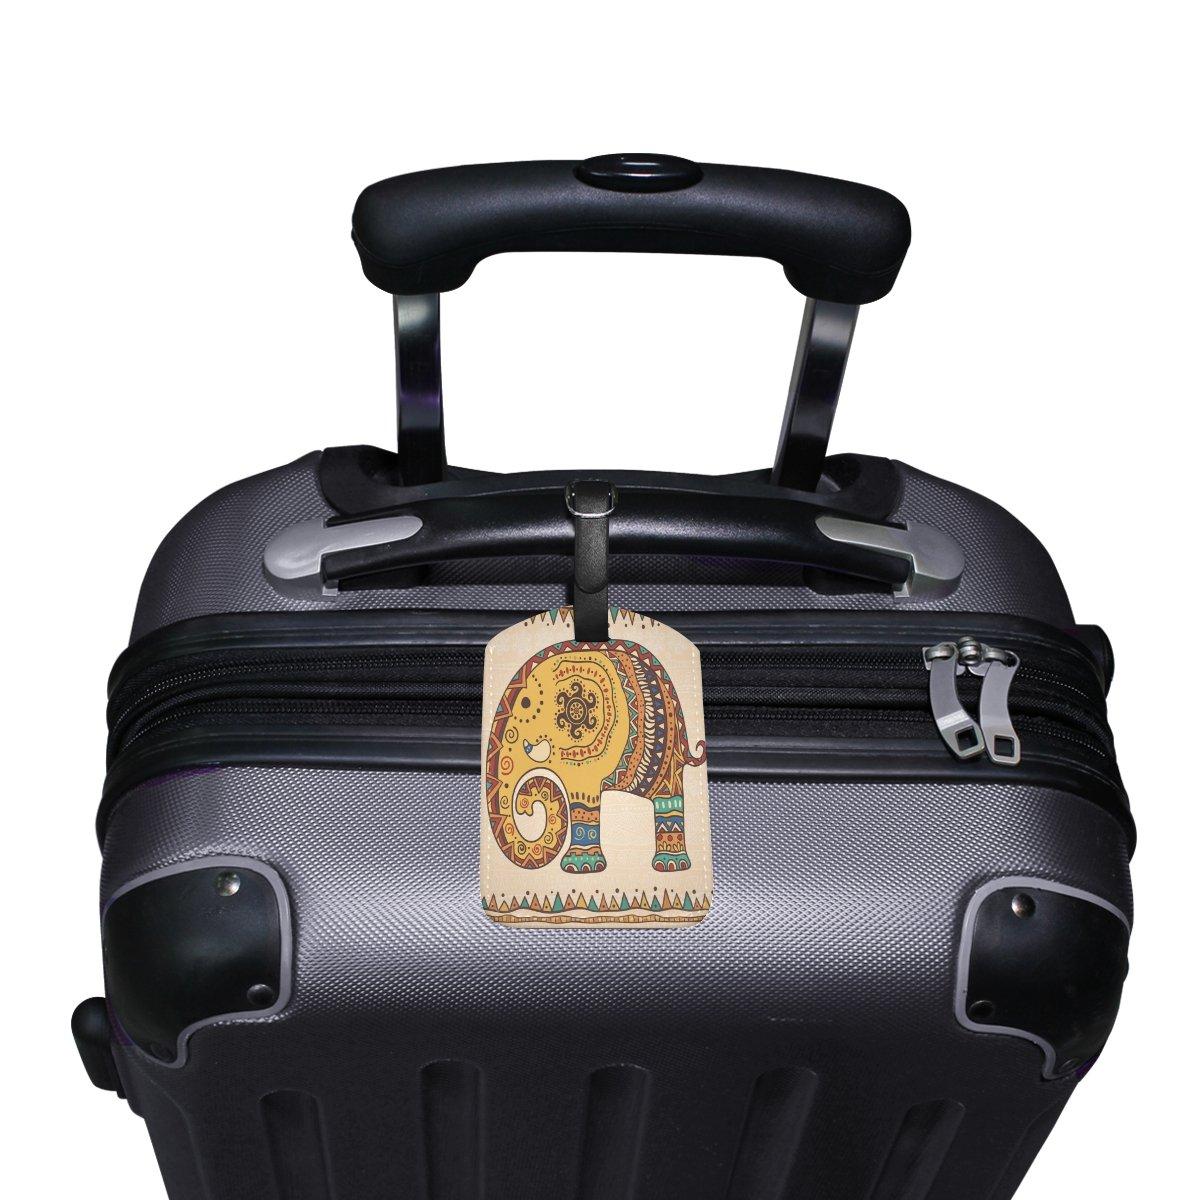 Saobao Travel Luggage Tag Illustration Elephant PU Leather Baggage Suitcase Travel ID Bag Tag 1Pcs